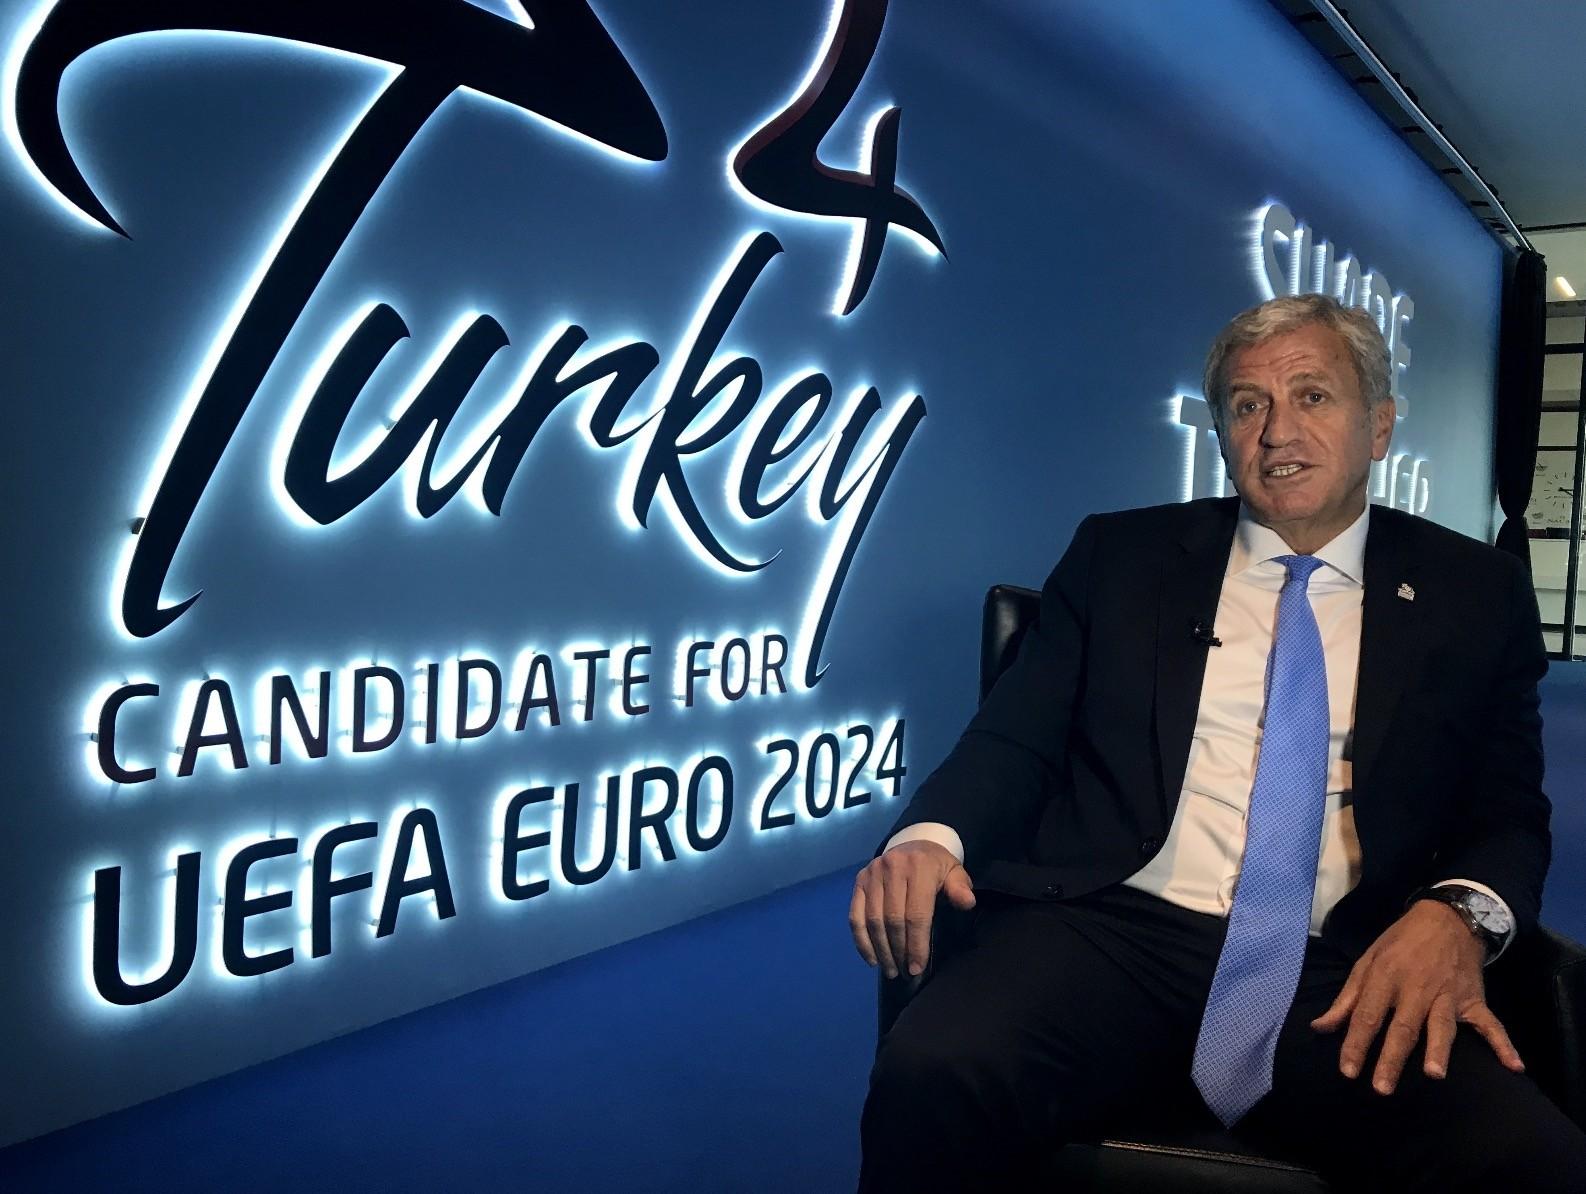 Turkish Football Federation Vice President Servet Yardu0131mcu0131.